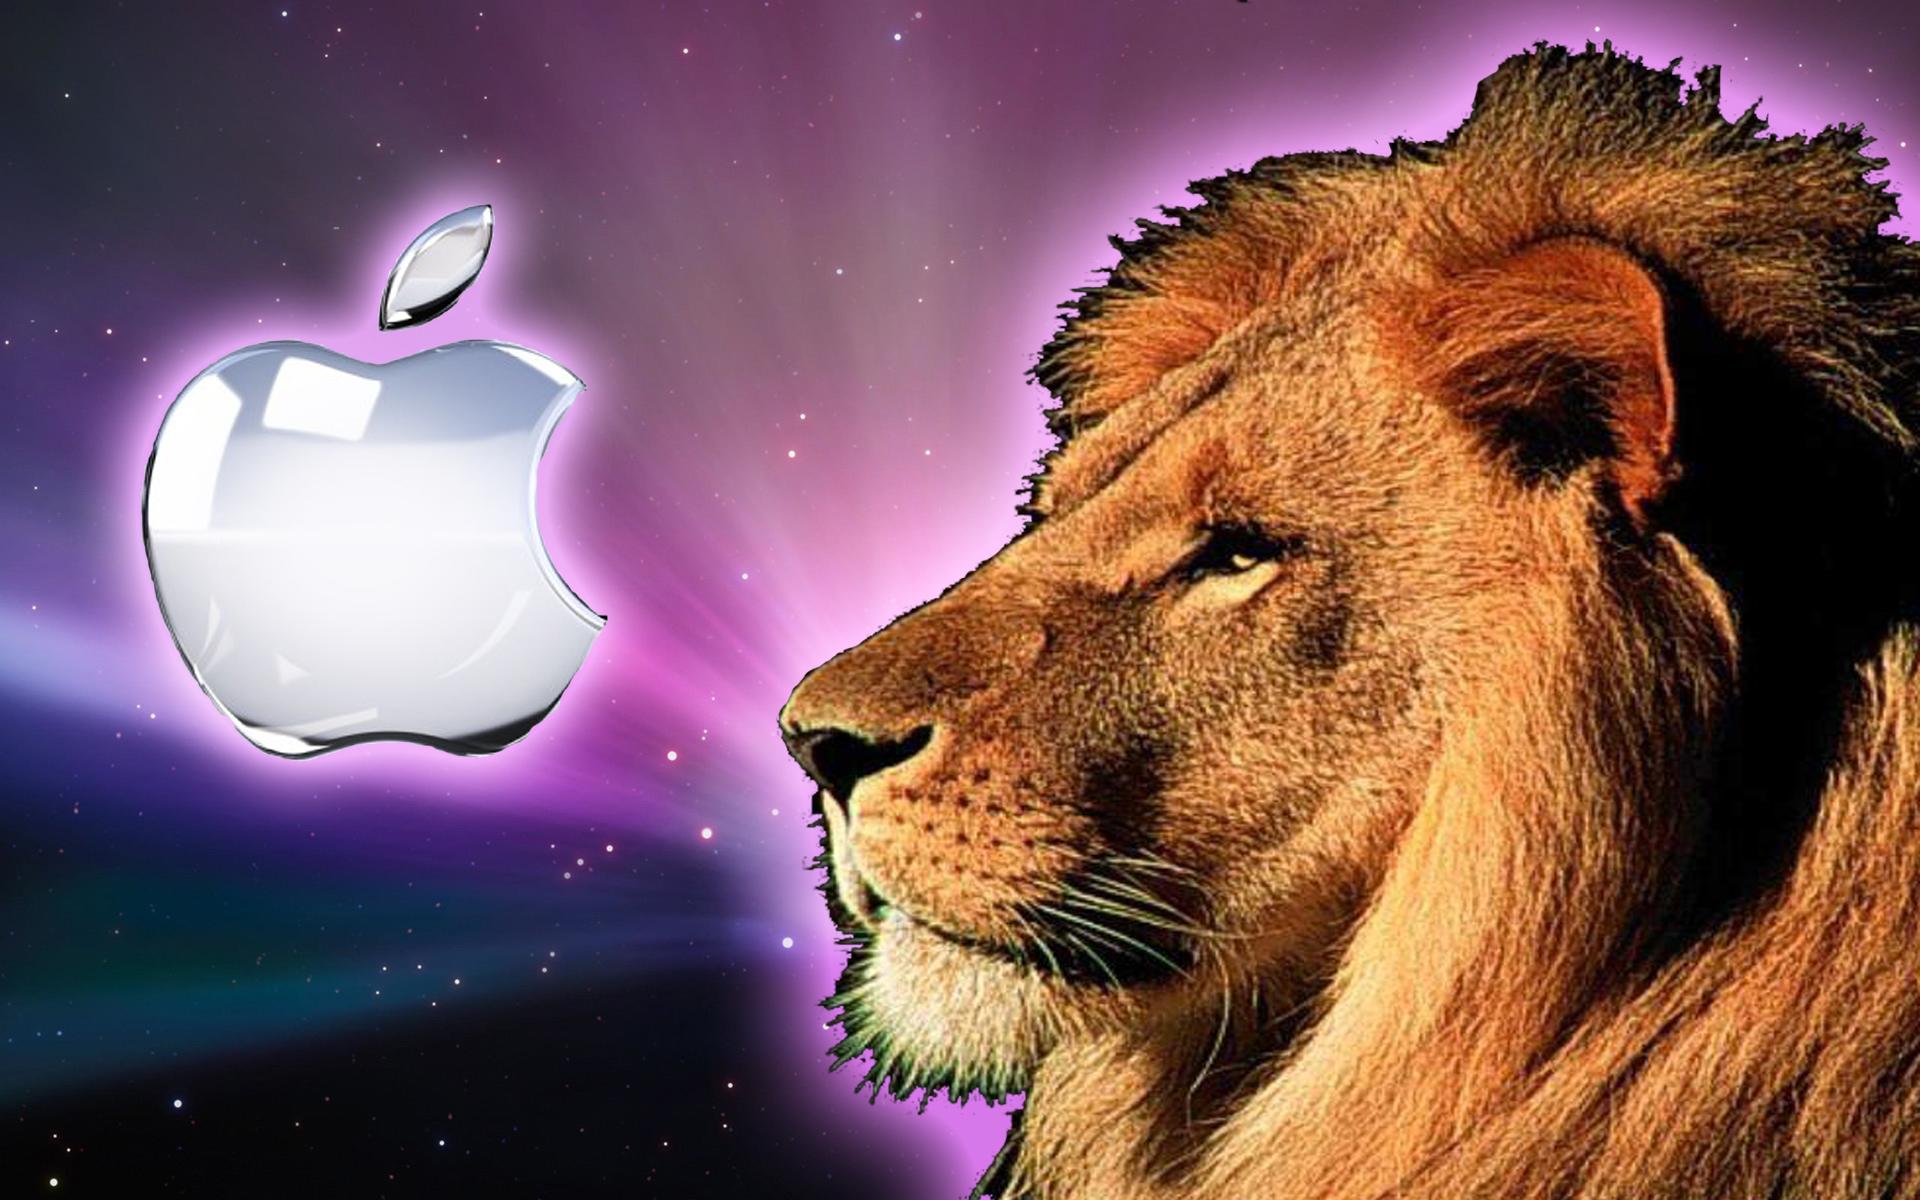 Once Upon A Time Wallpaper Iphone Mac Os X Lion 10 Fantastici Wallpaper Da Scaricare Gratis